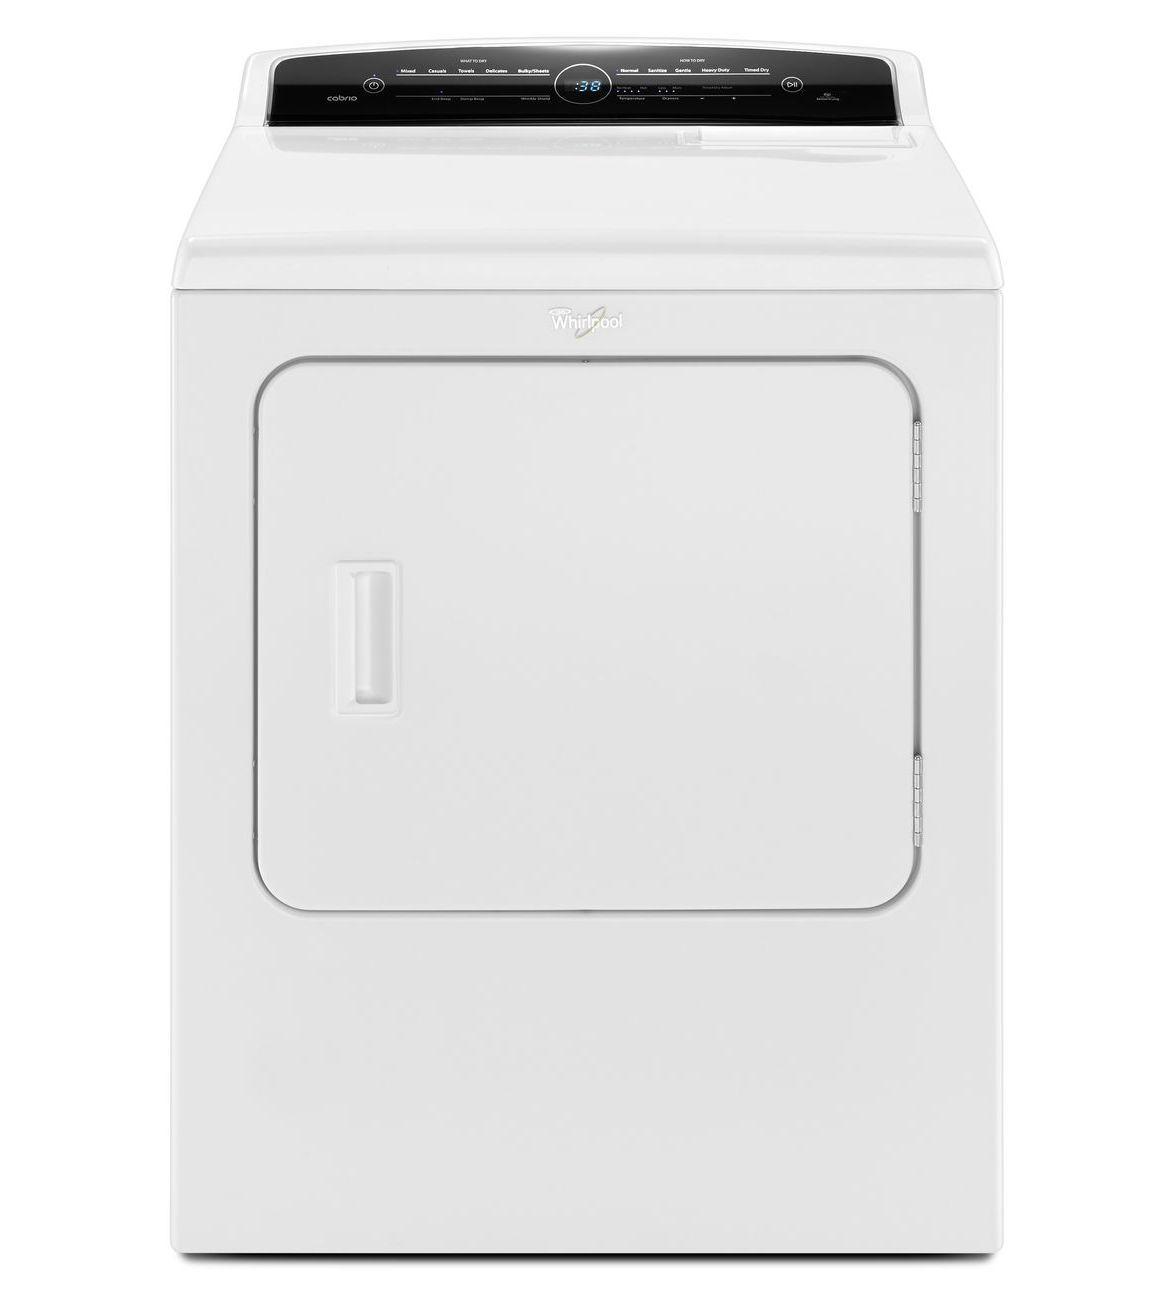 7.0 cu. ft. Cabrio High-Efficiency Electric Dryer